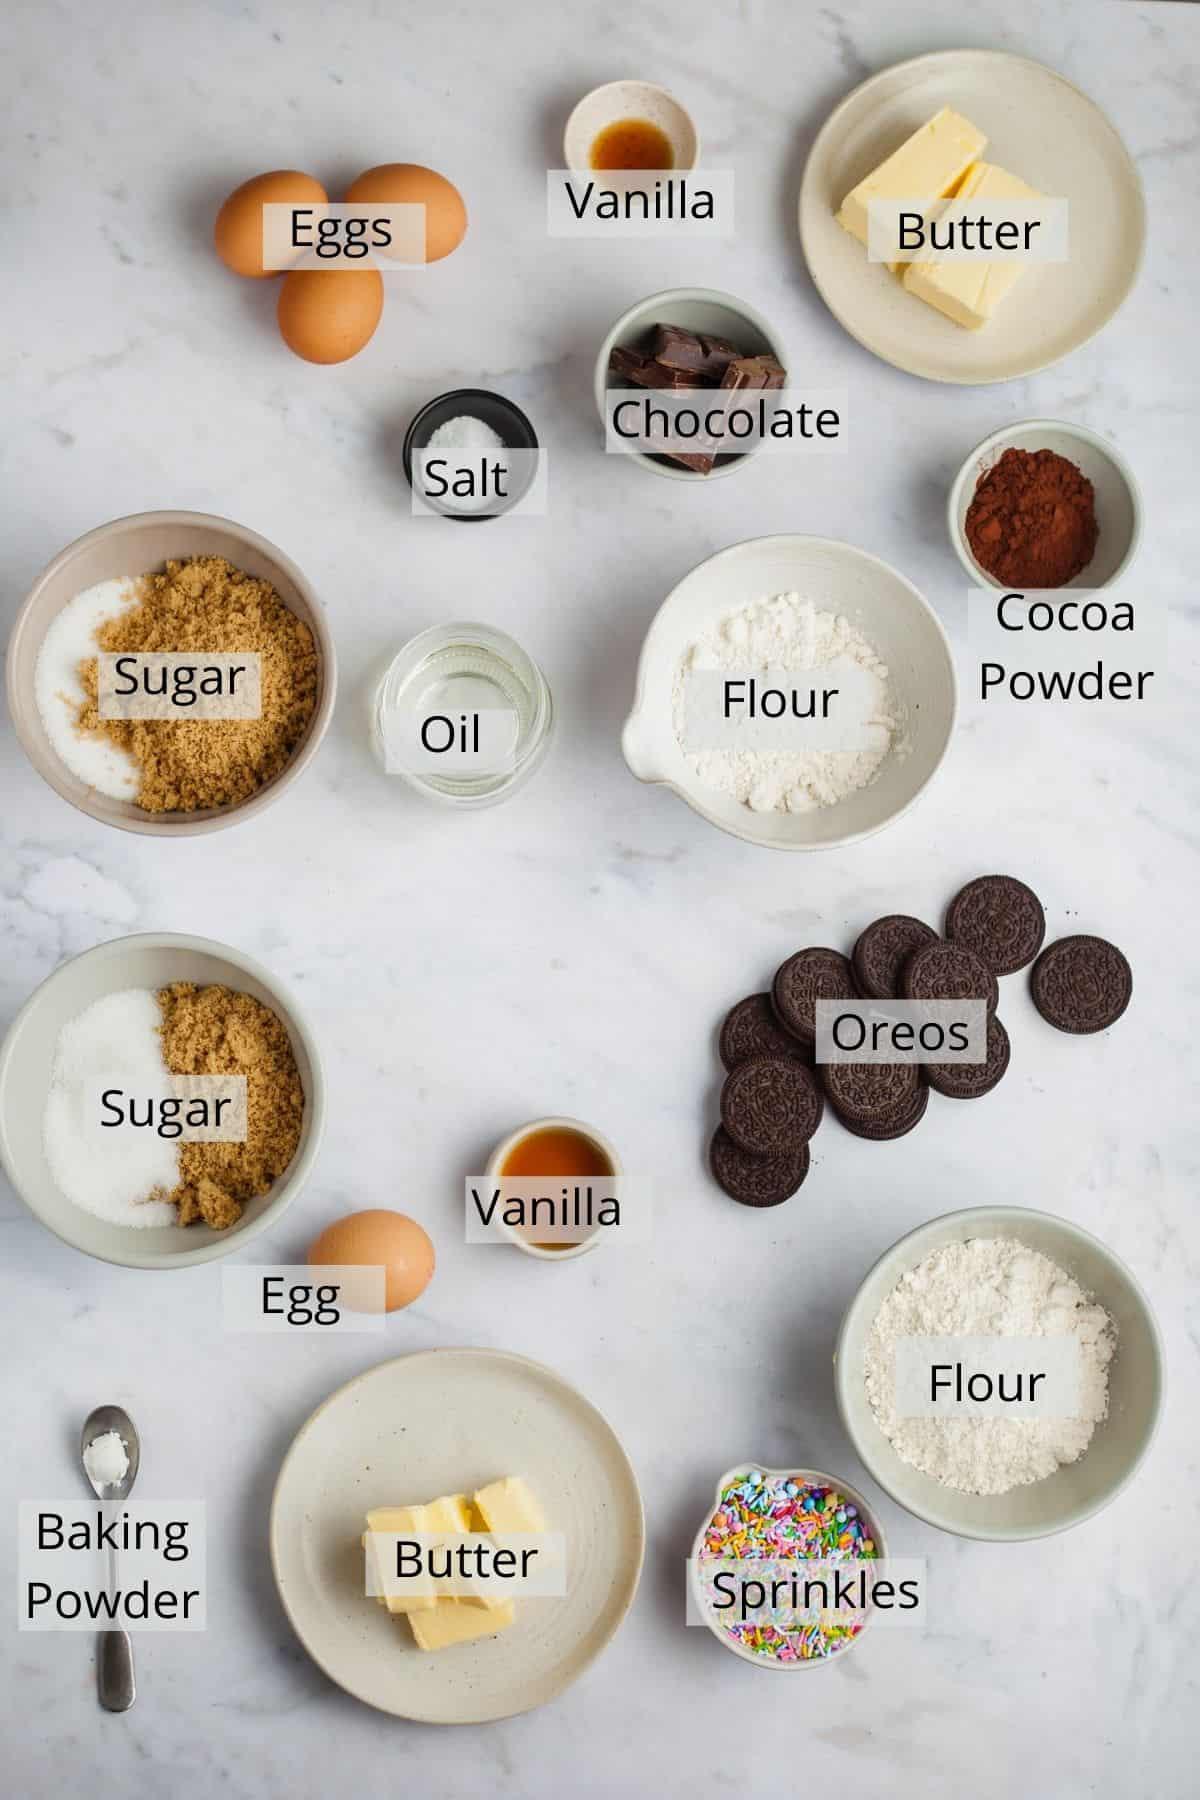 Ingredients needed for birthday cake brownies